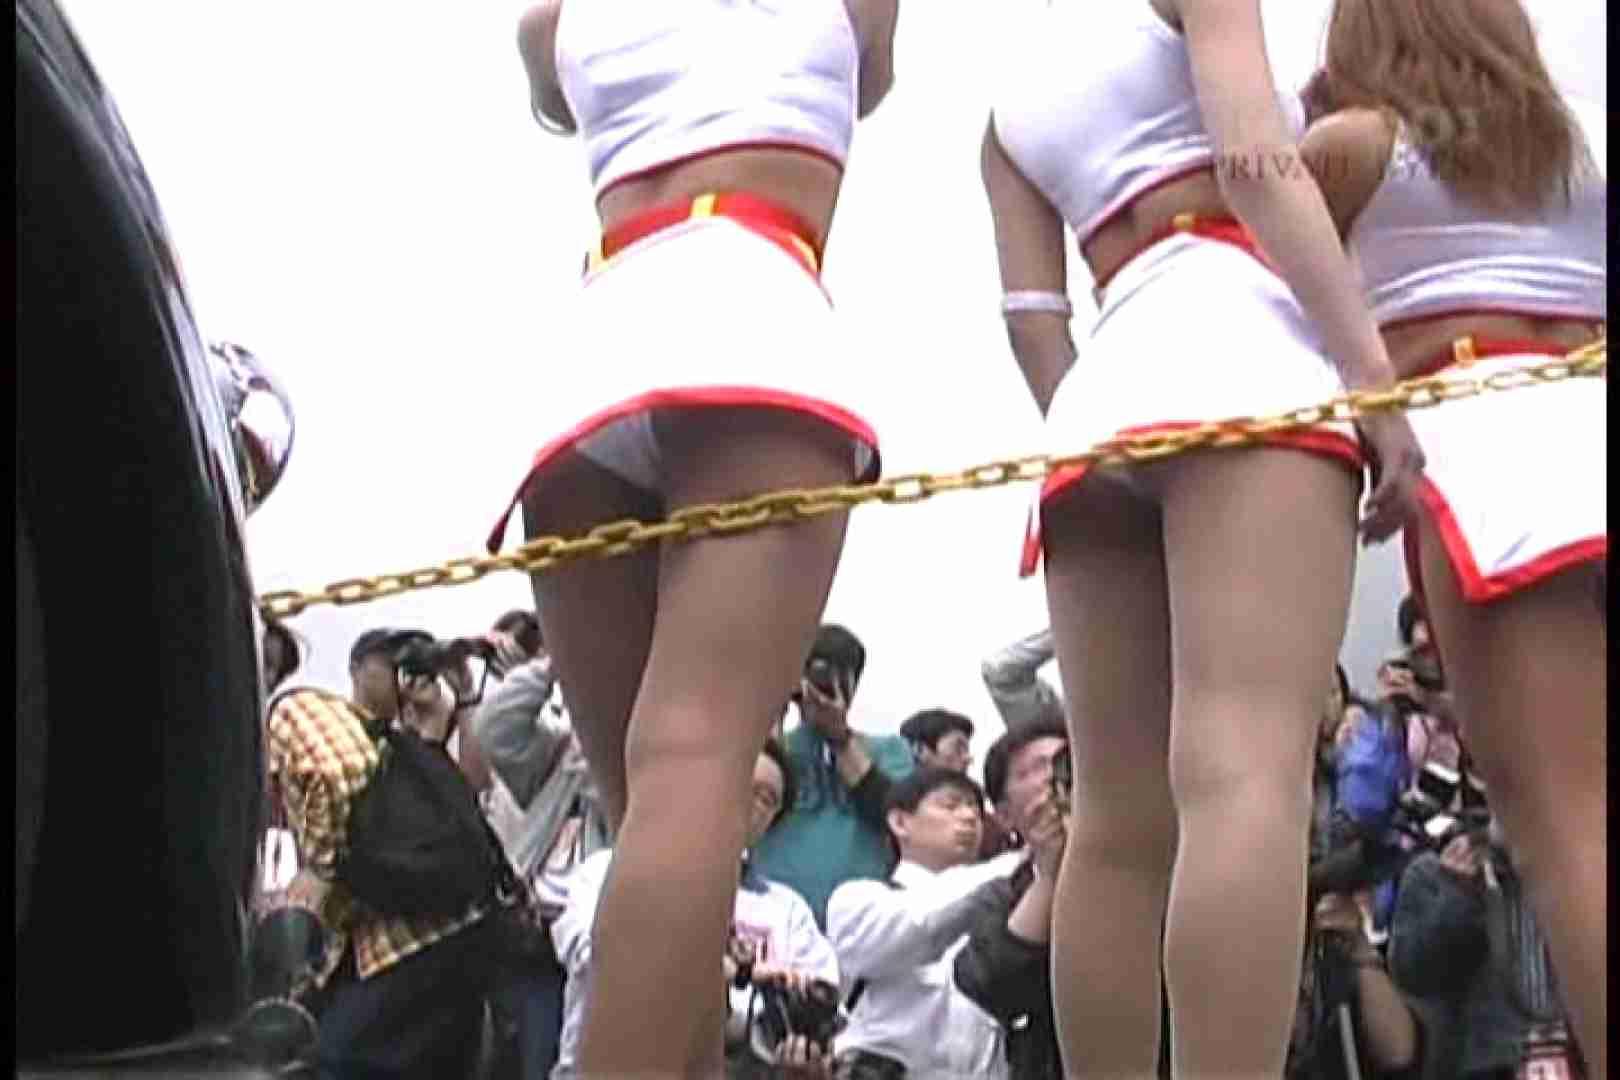 高画質版!SPD-001 サーキットの女神達 Vol.00 名作映像 | 高画質  109PIX 16